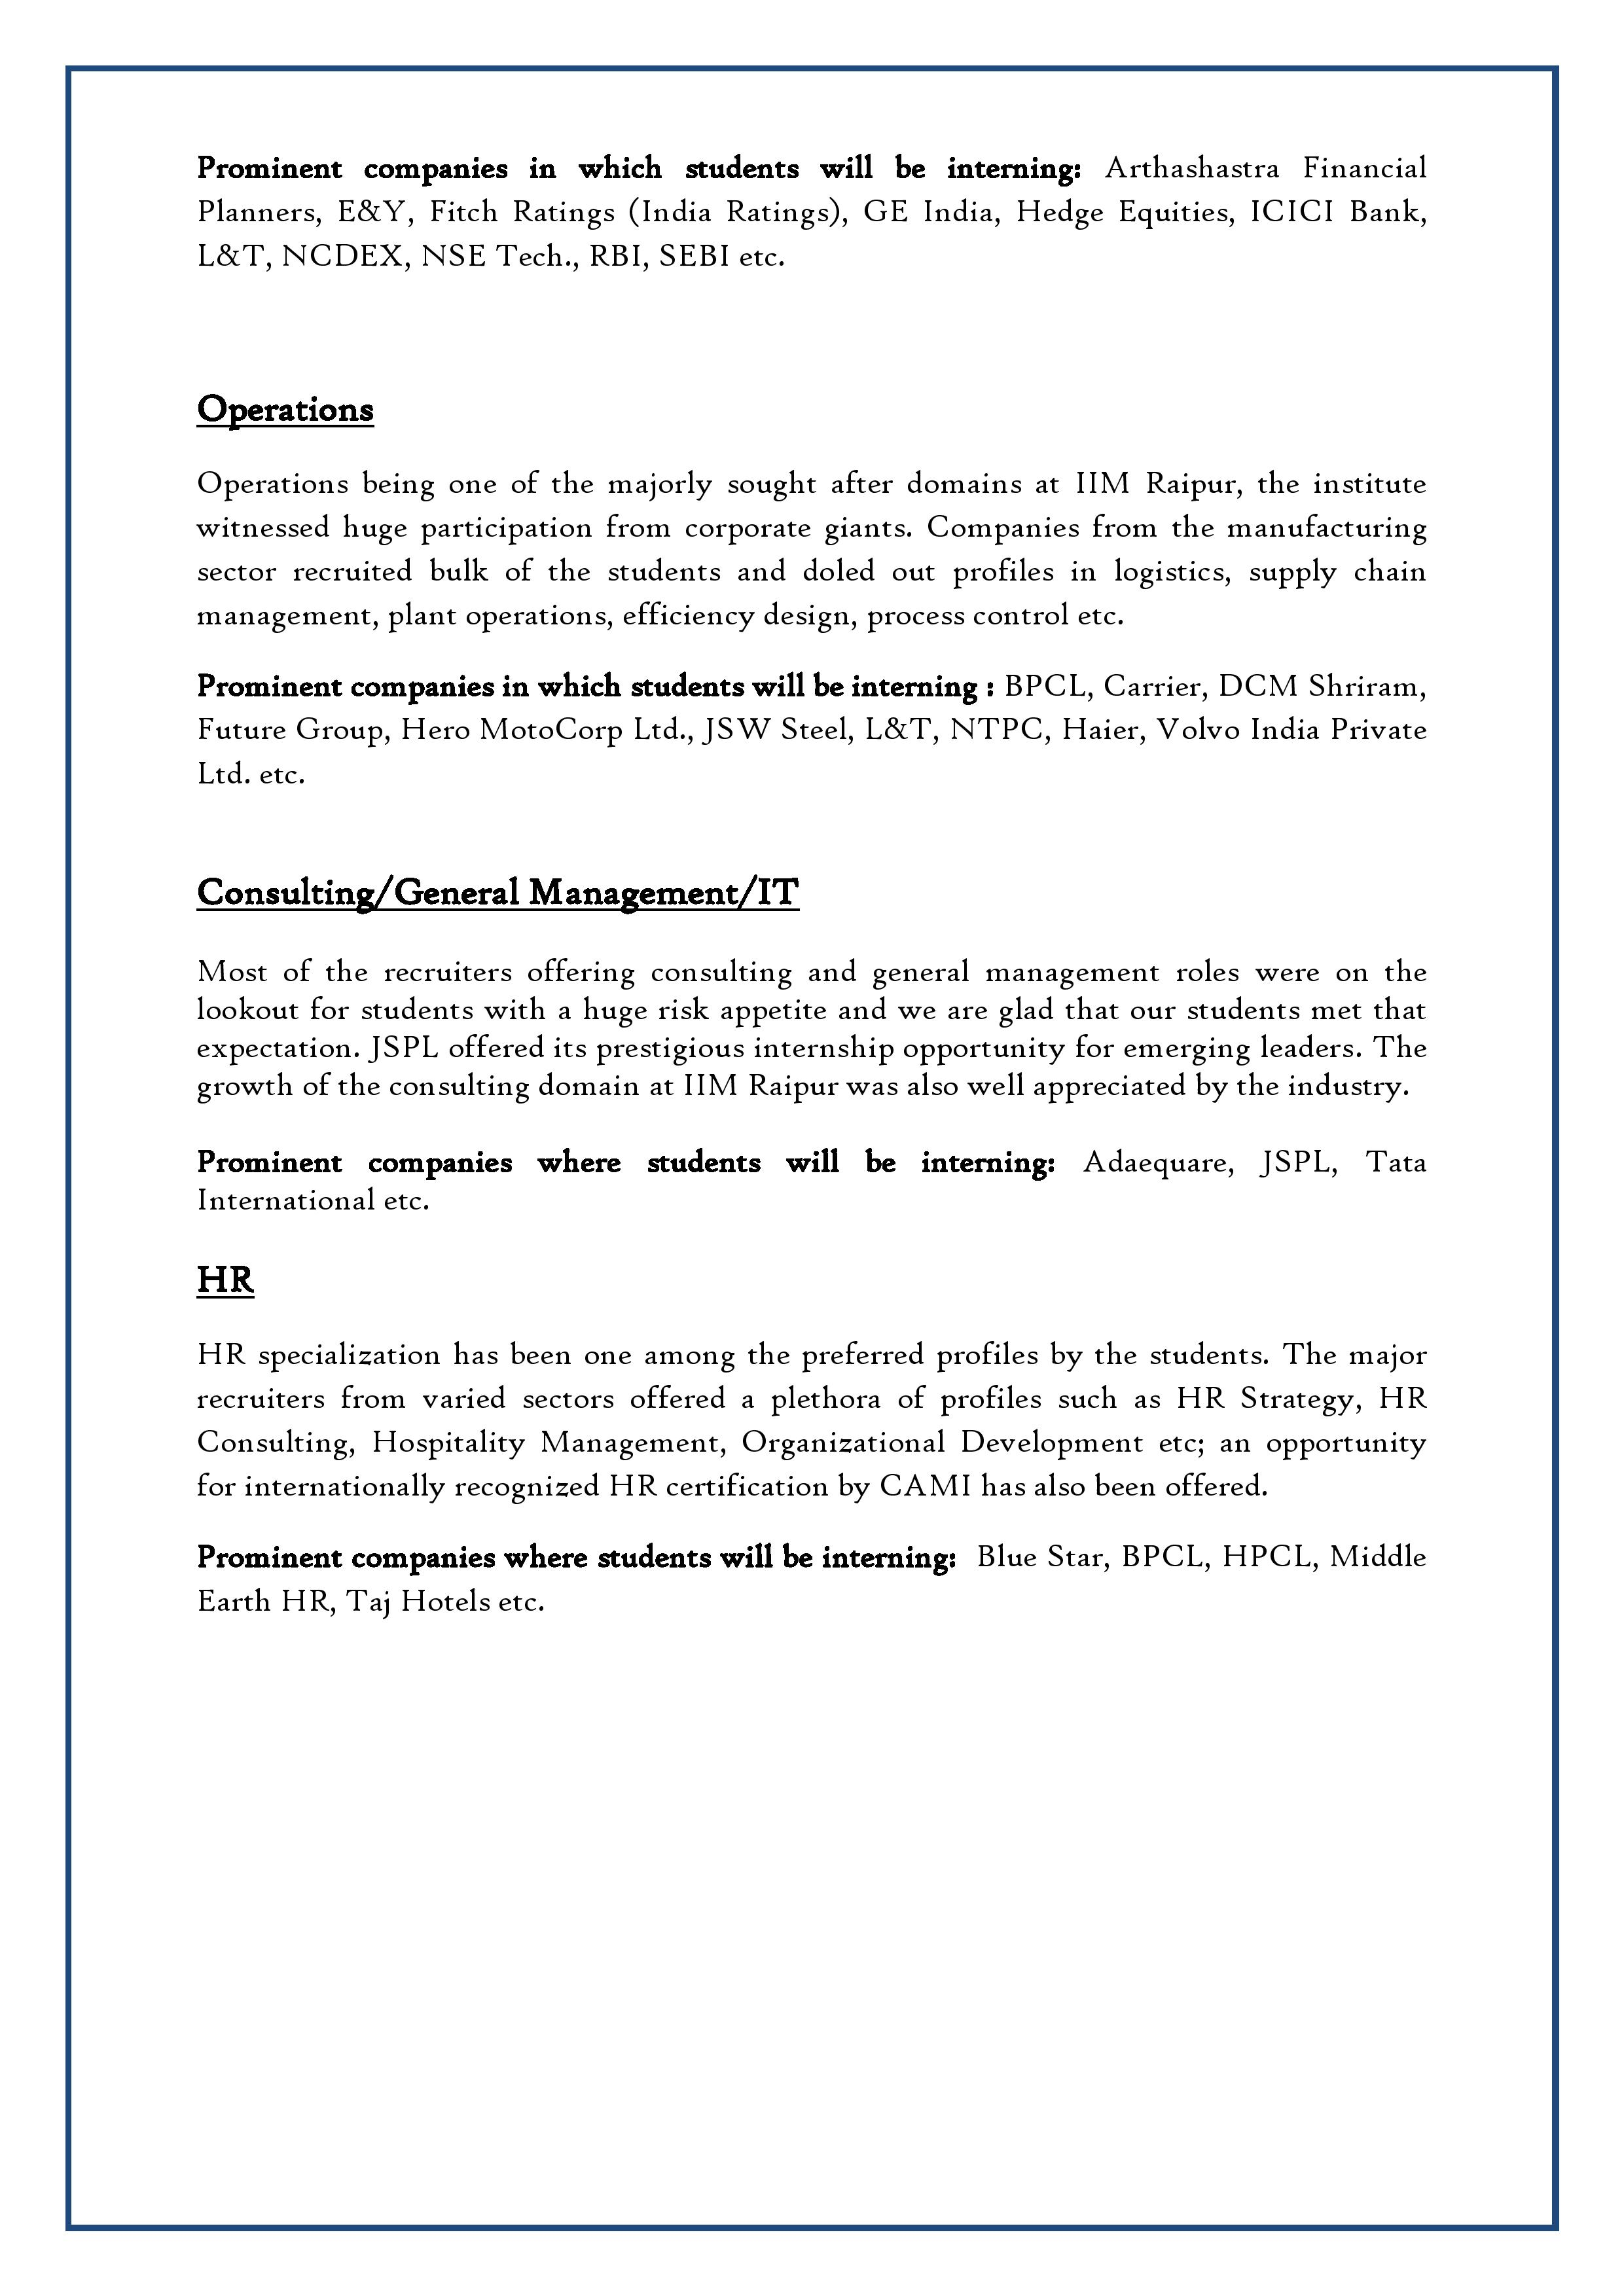 IIM Raipur_Summer Internship Report 2014-2016 - 18-02-2015